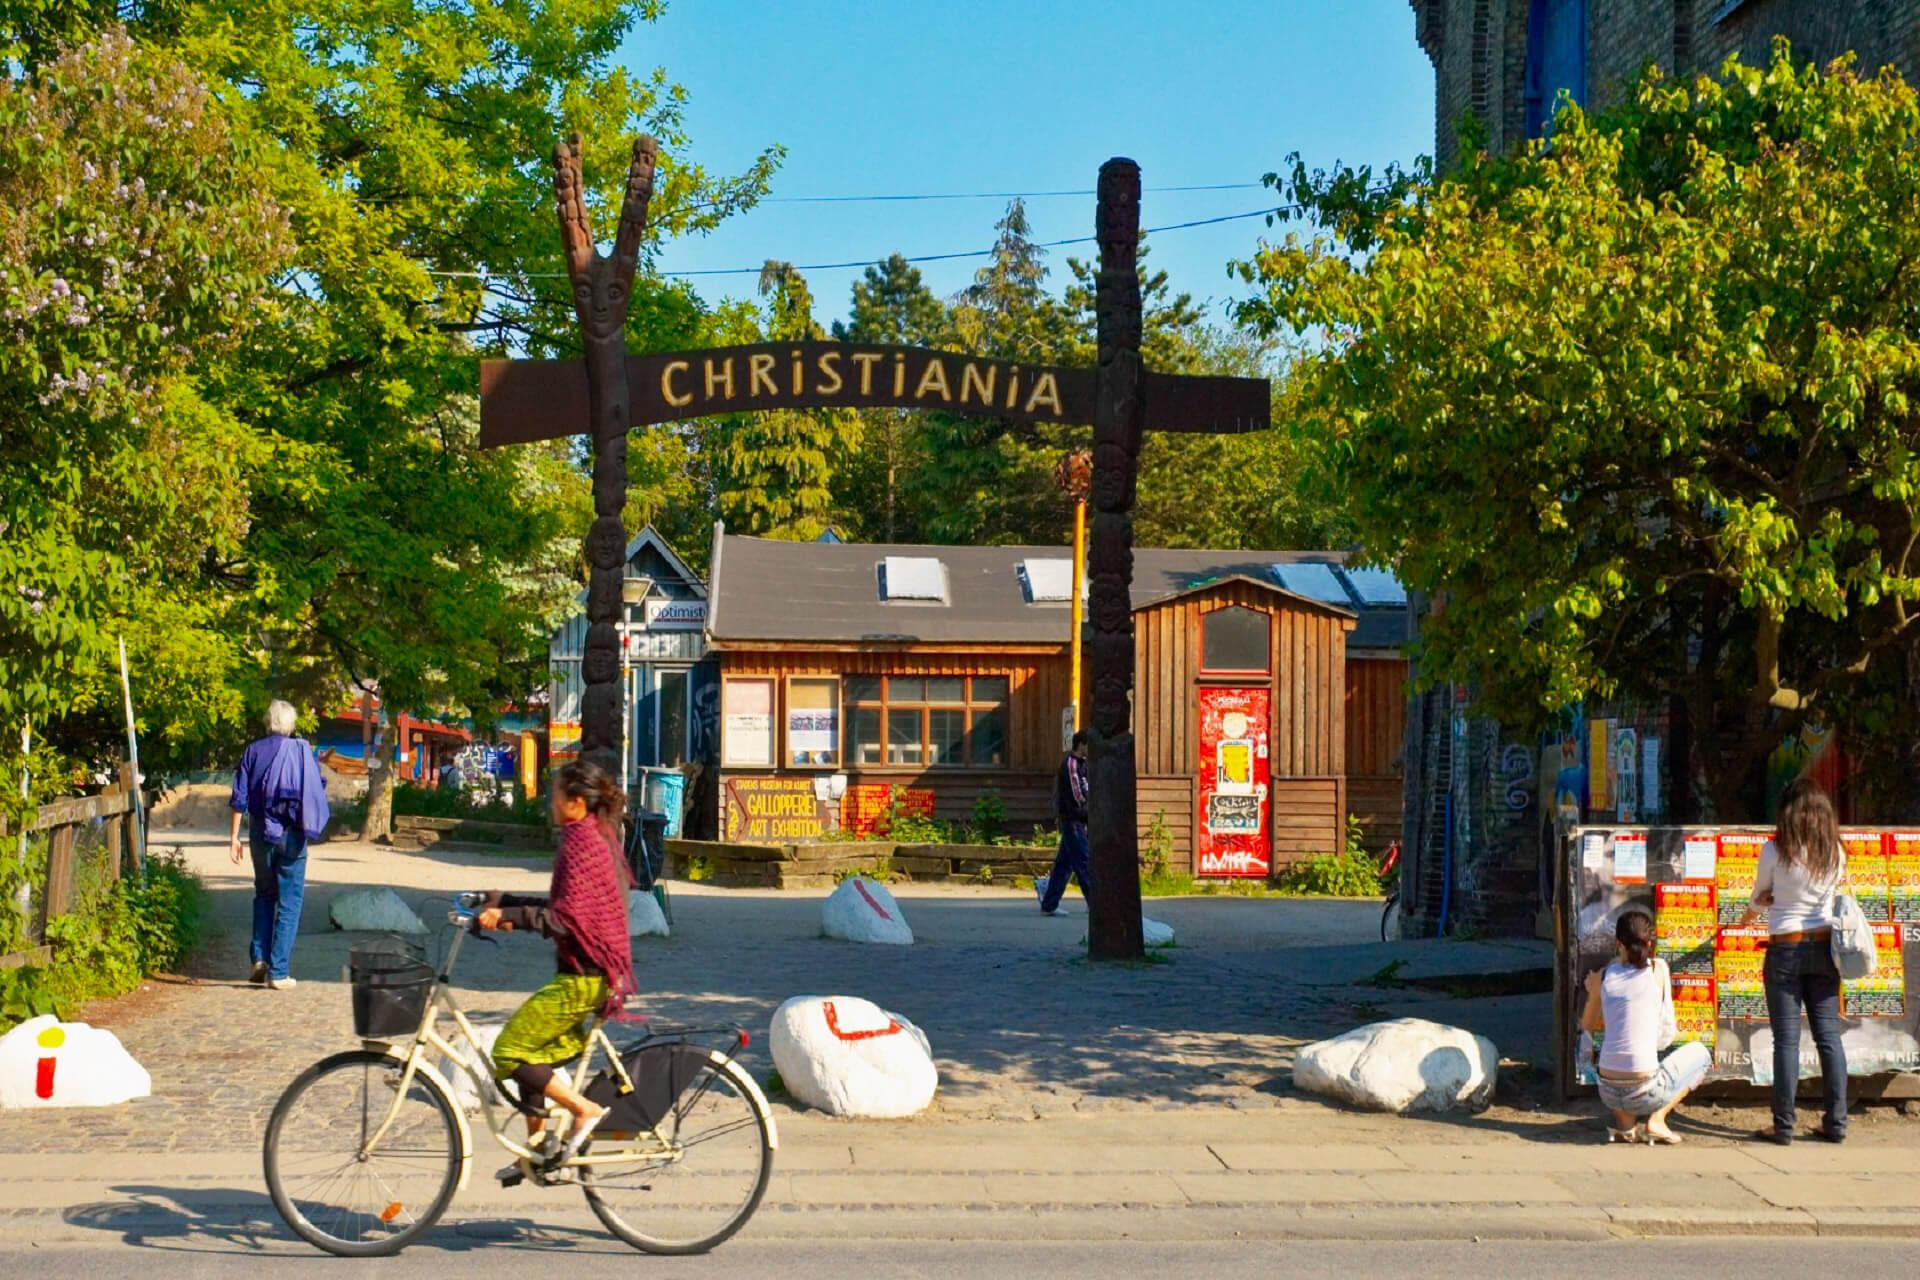 Freetown Christiania - Inexpensive Pleasure In Expensive Copenhagen